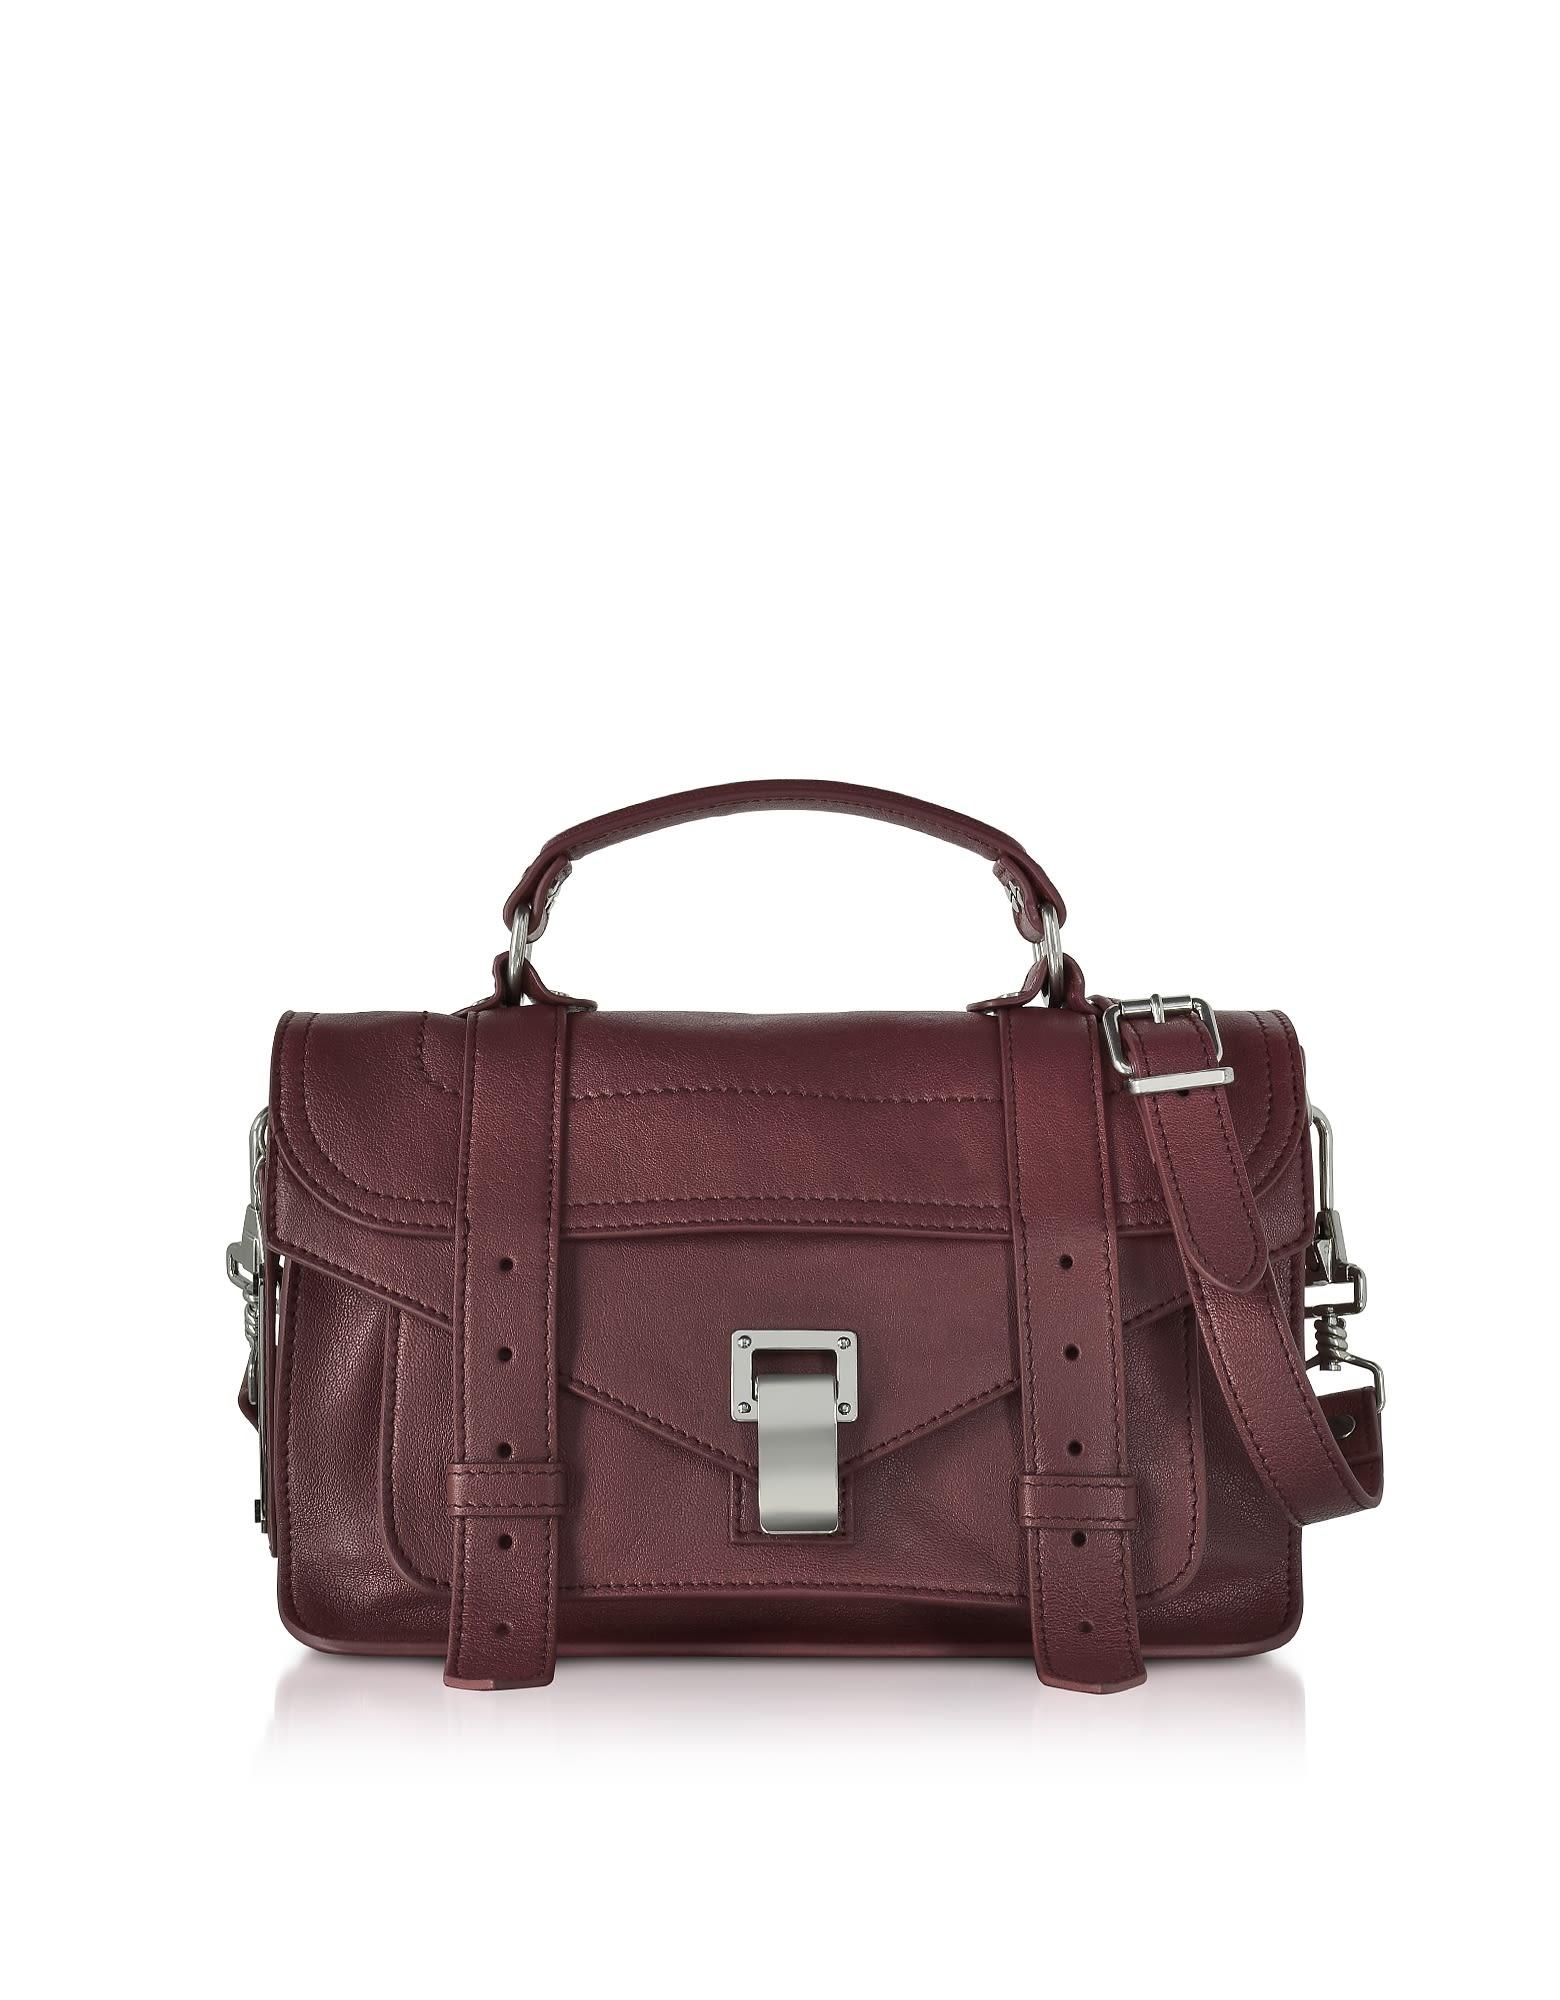 Proenza Schouler Ps1 Tiny Cordovan Lux Leather Satchel Bag In Bordeaux 536c9a6627